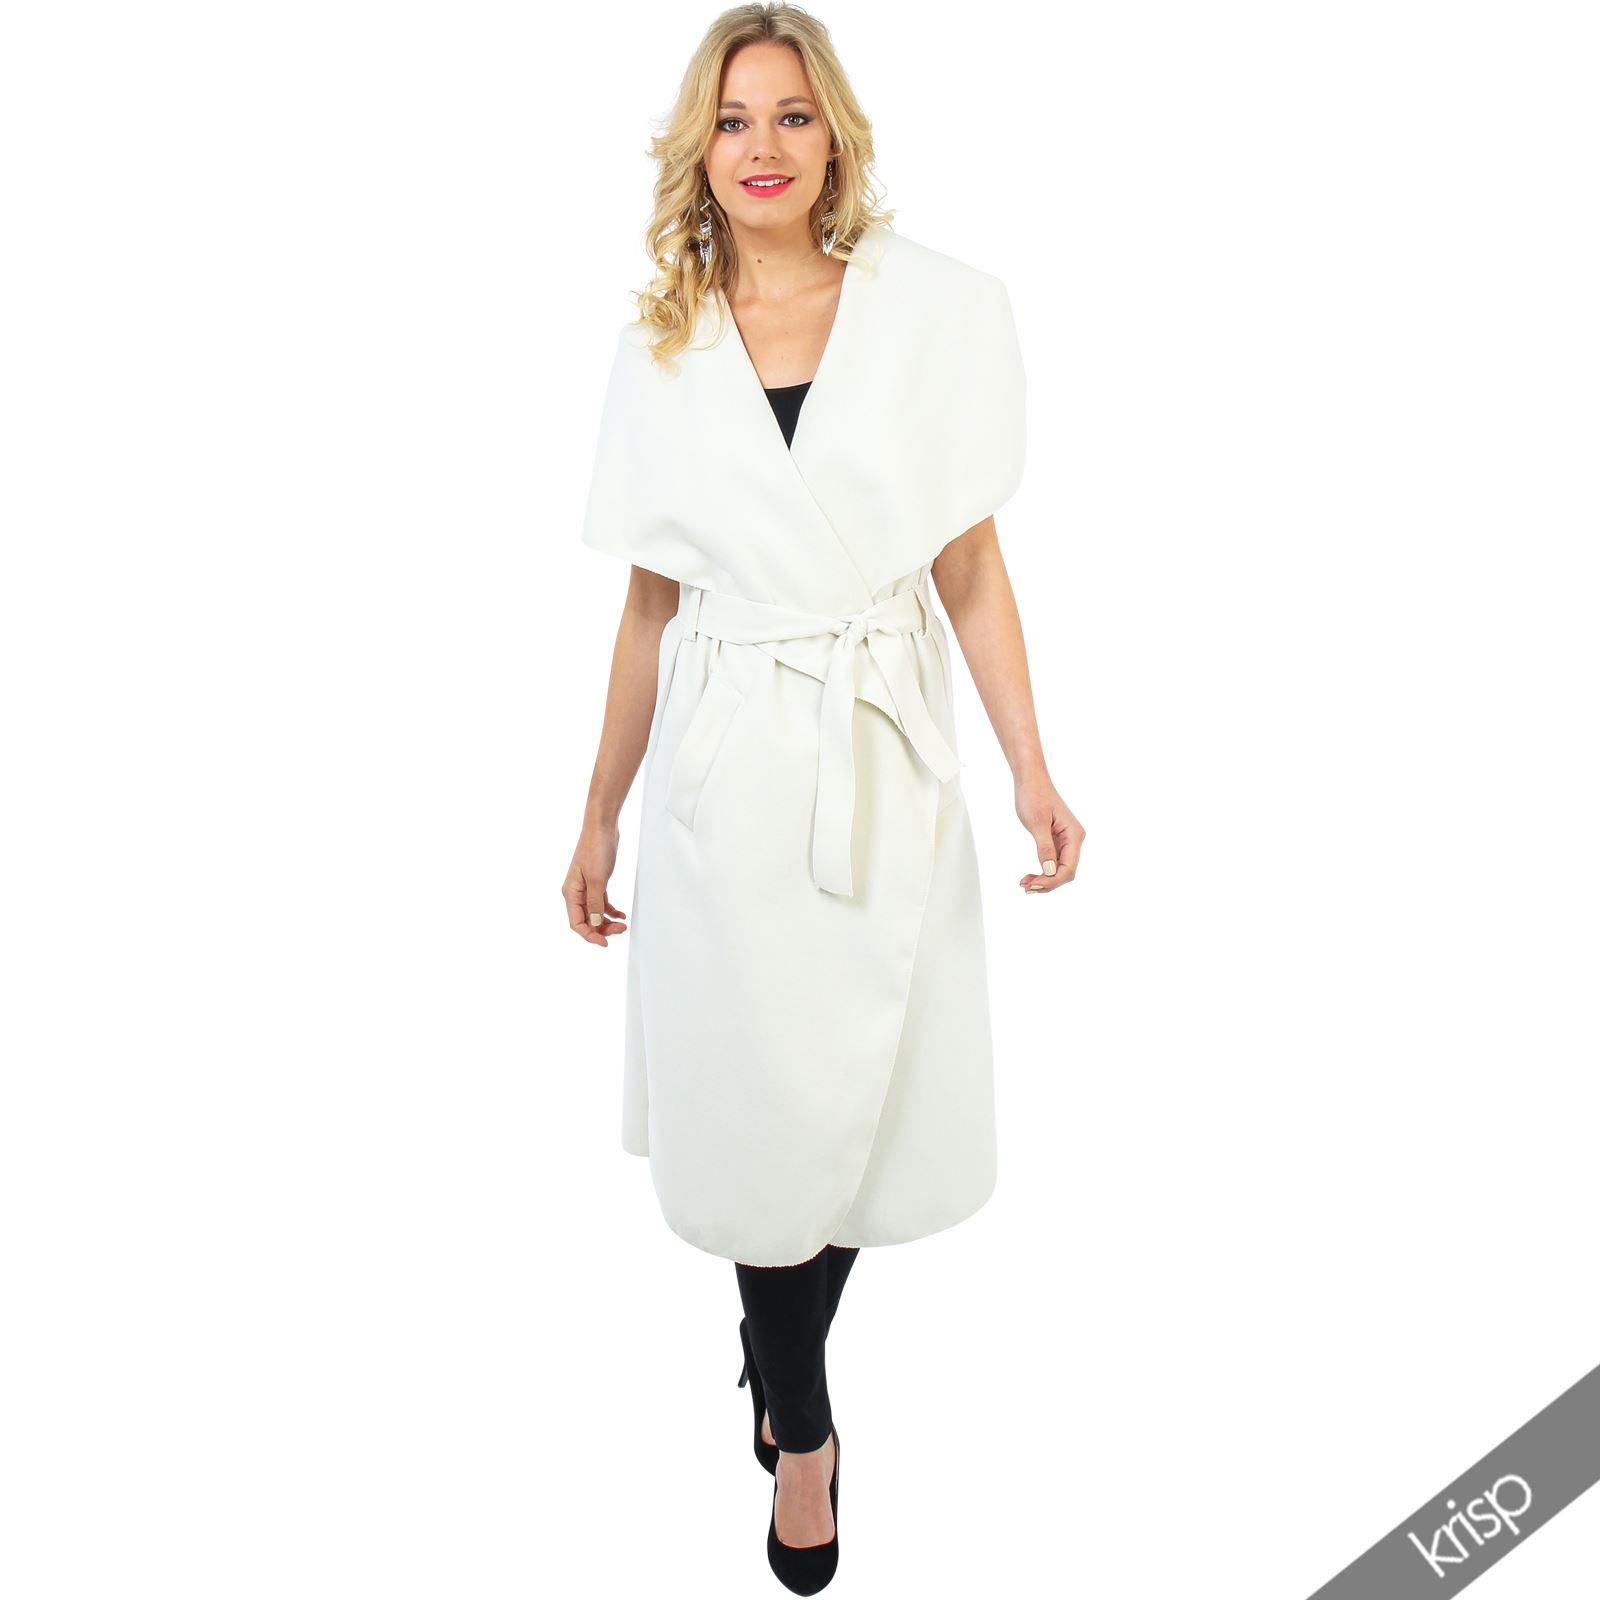 damen rmelloser langer mantel trechcoat cardigan cape sommermantel schalkragen ebay. Black Bedroom Furniture Sets. Home Design Ideas